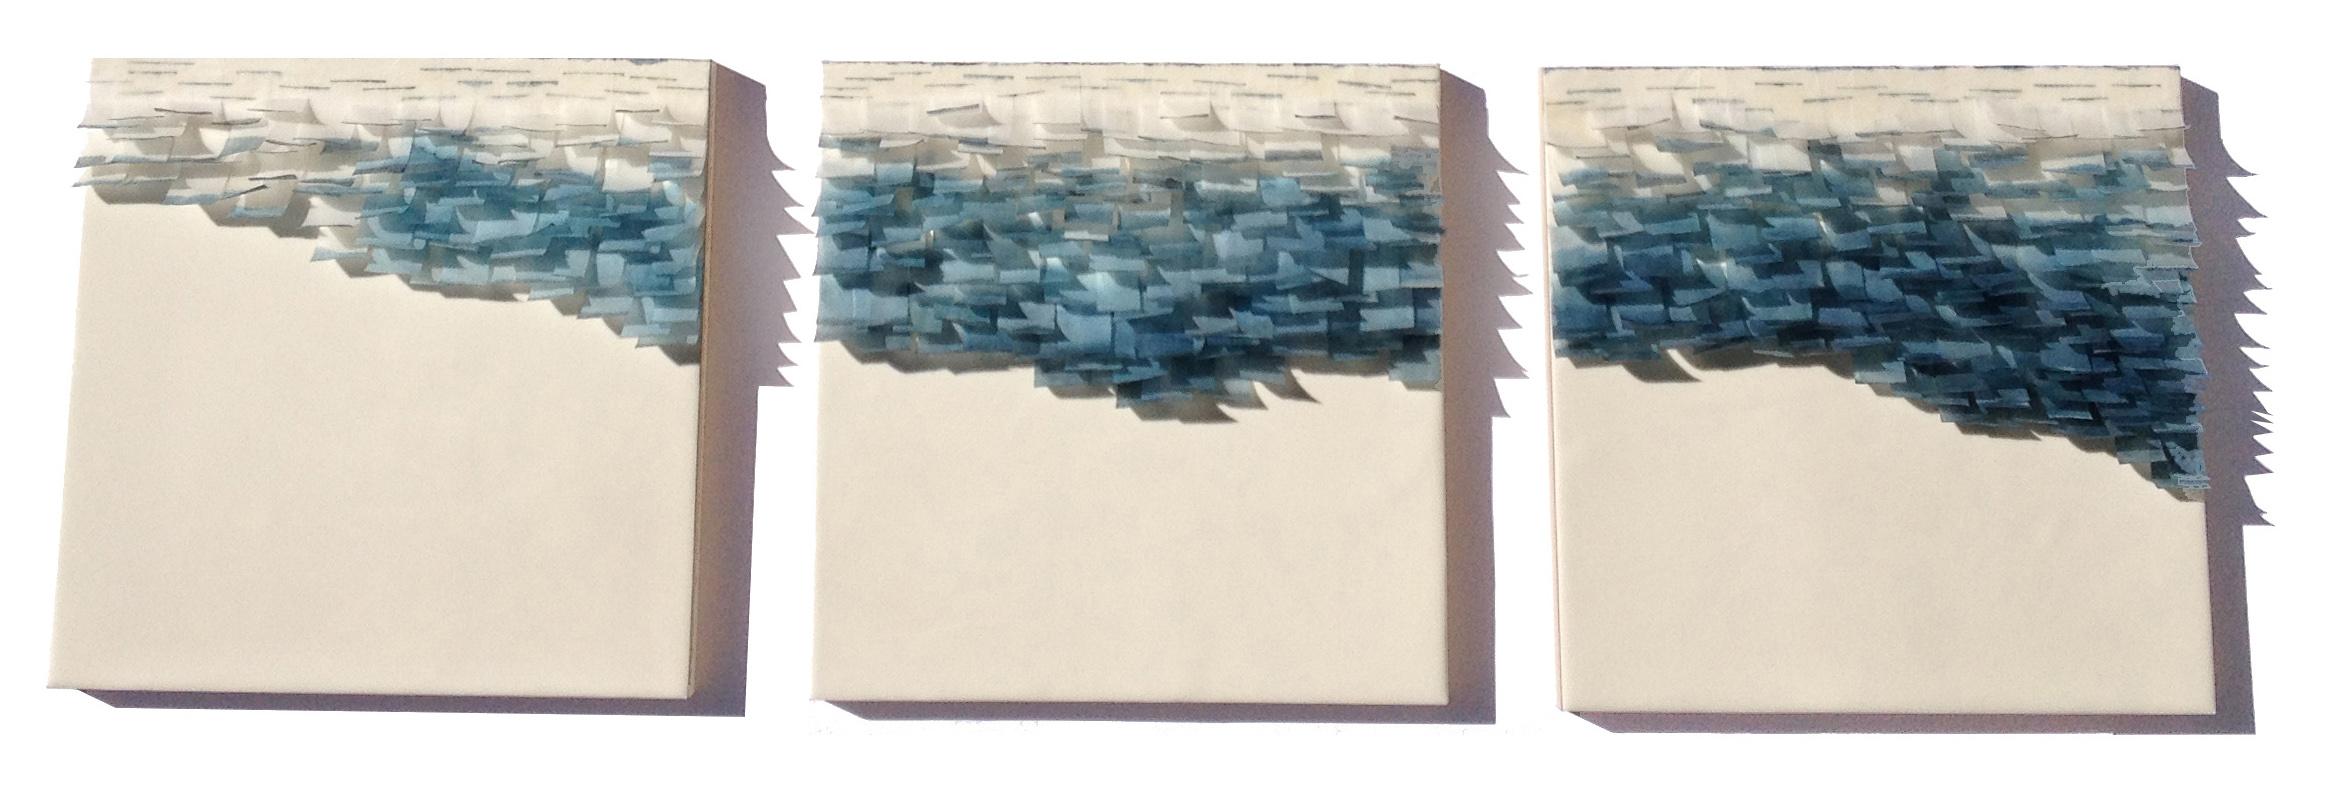 "Flutter 4, 2014 Encaustic, Mulberry Paper, Watercolor 36"" x 12""x 1"" SOLD"